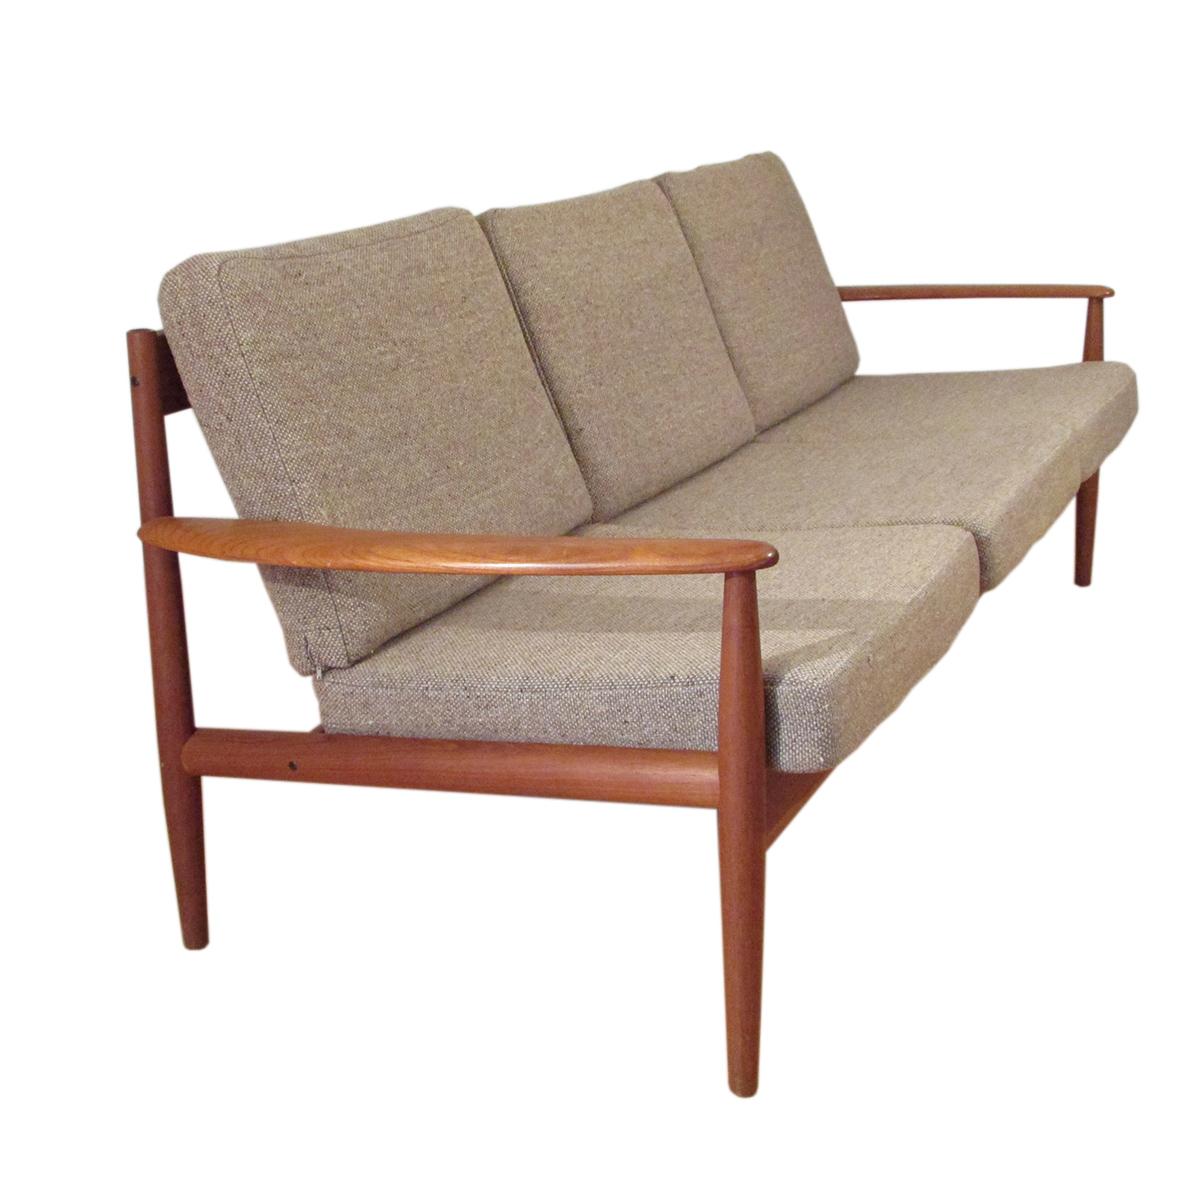 mid-century-modern-sofa-teak-jalk